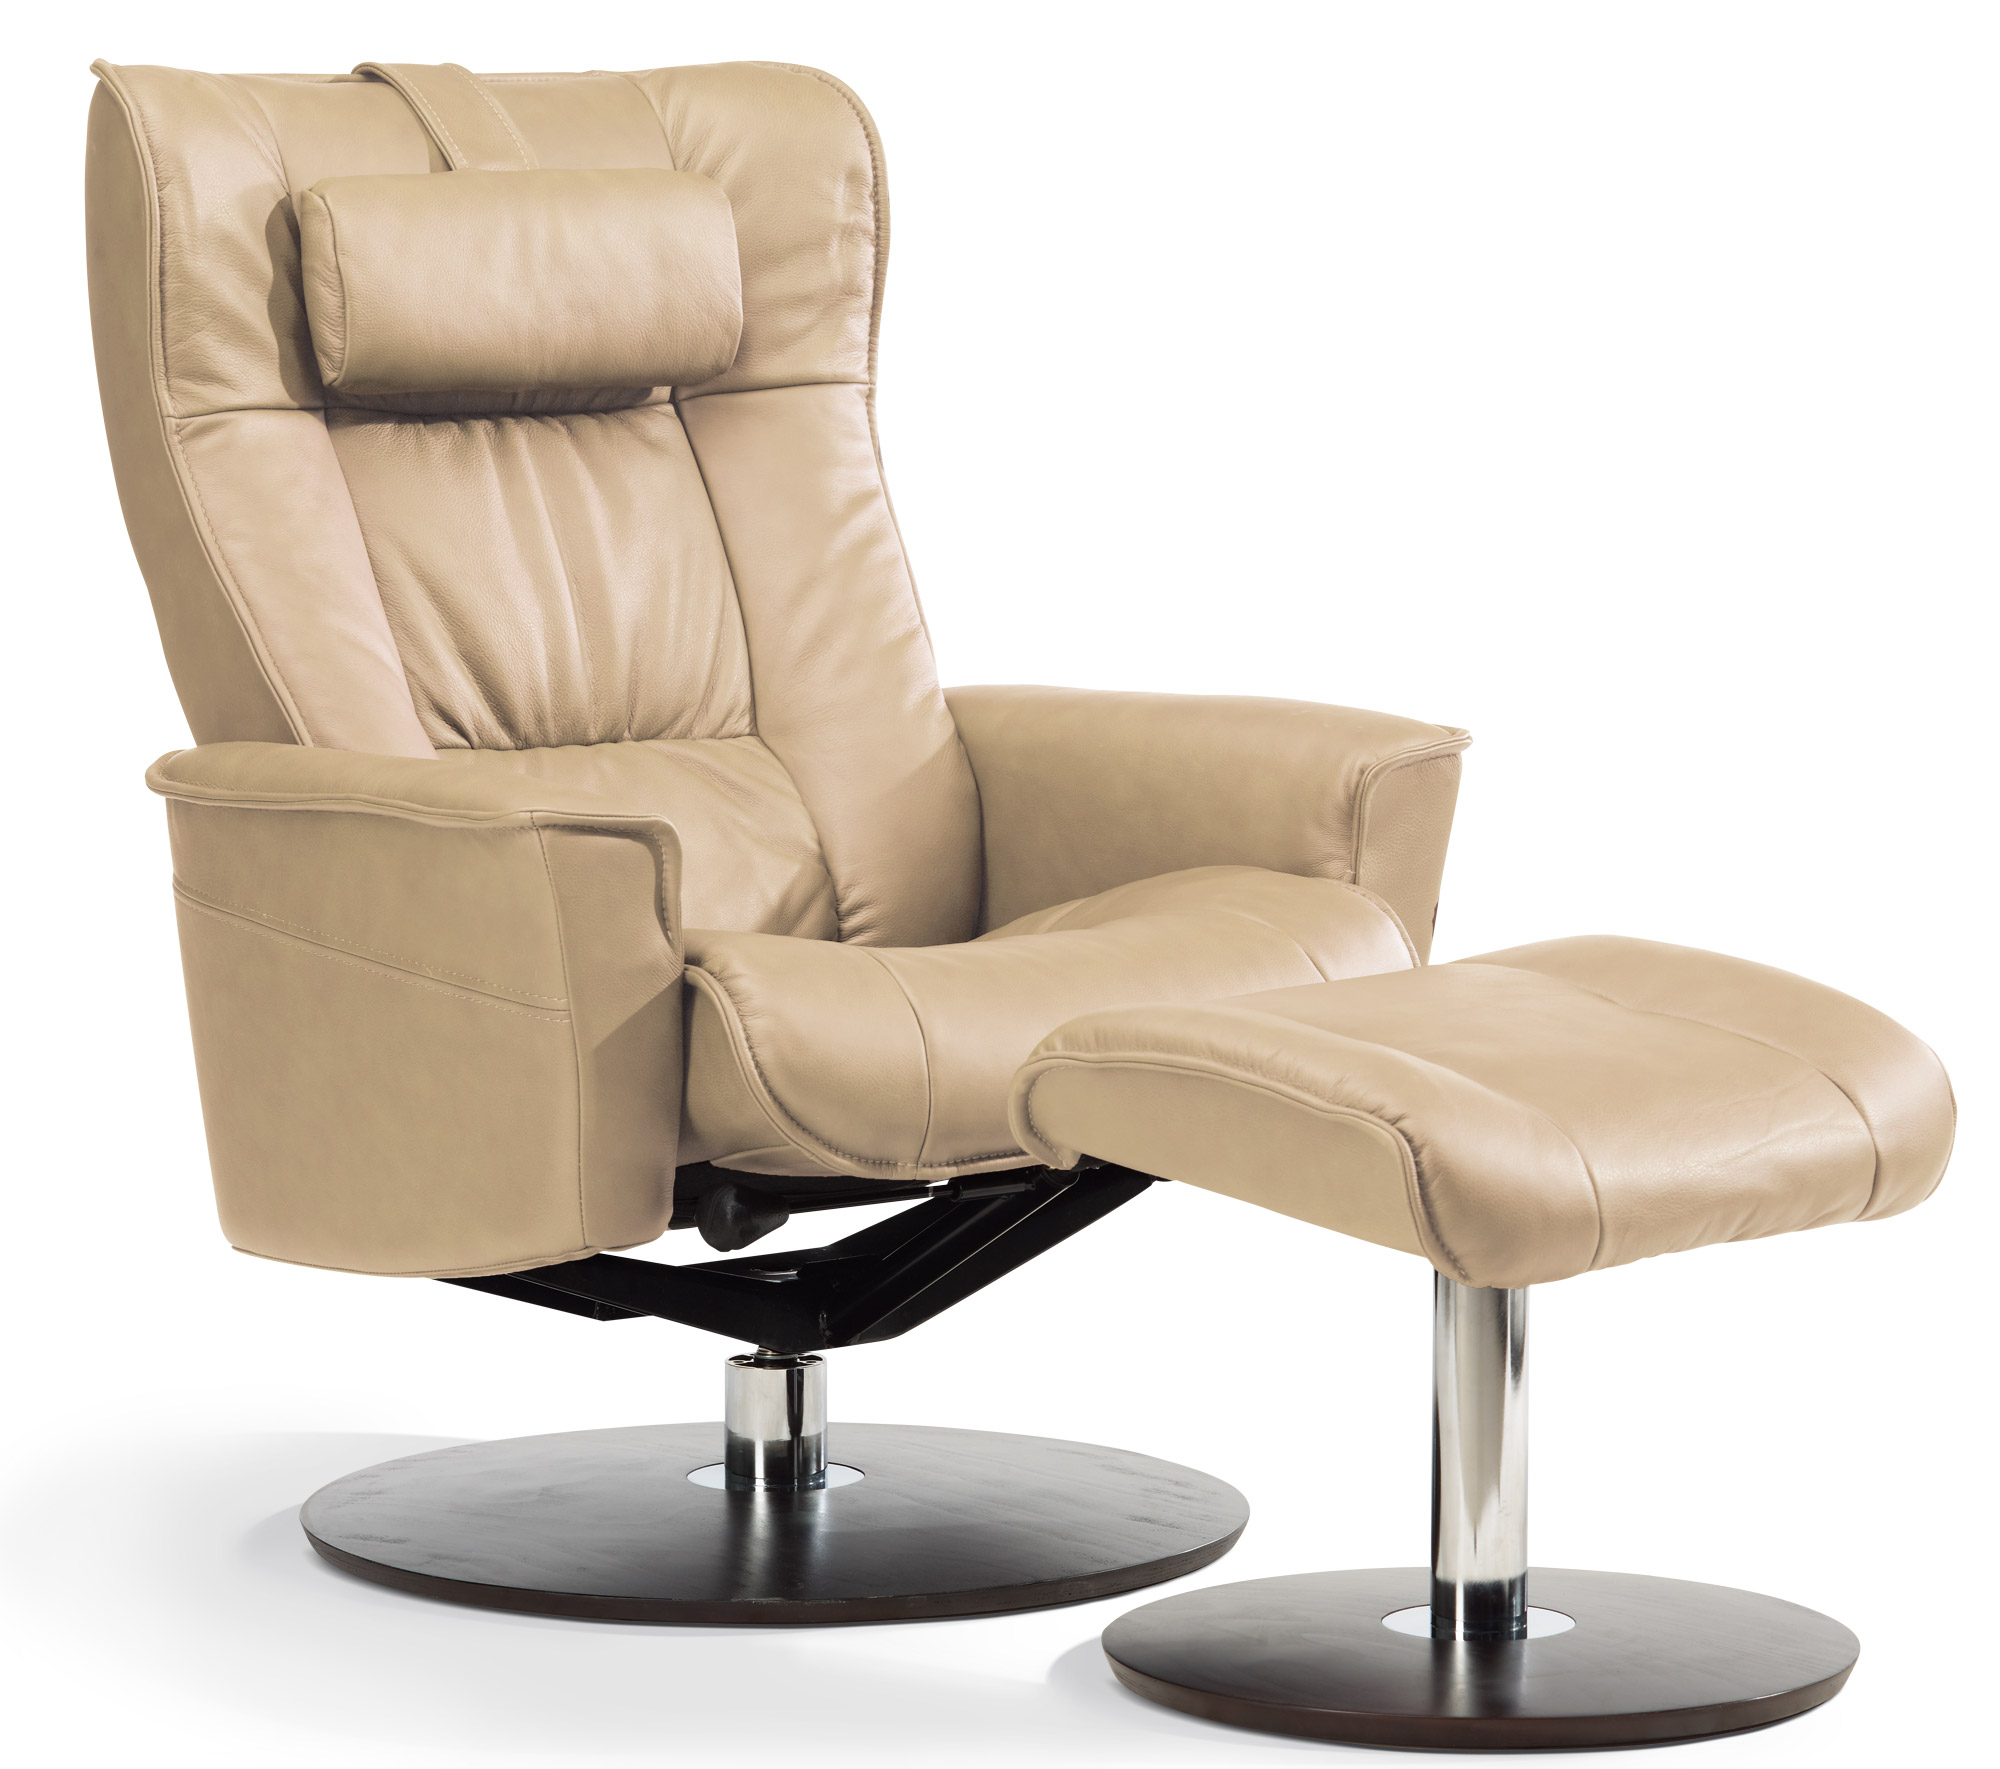 Sitwell Gernot Steifensand Relax Sessel - Der Elegante in creme